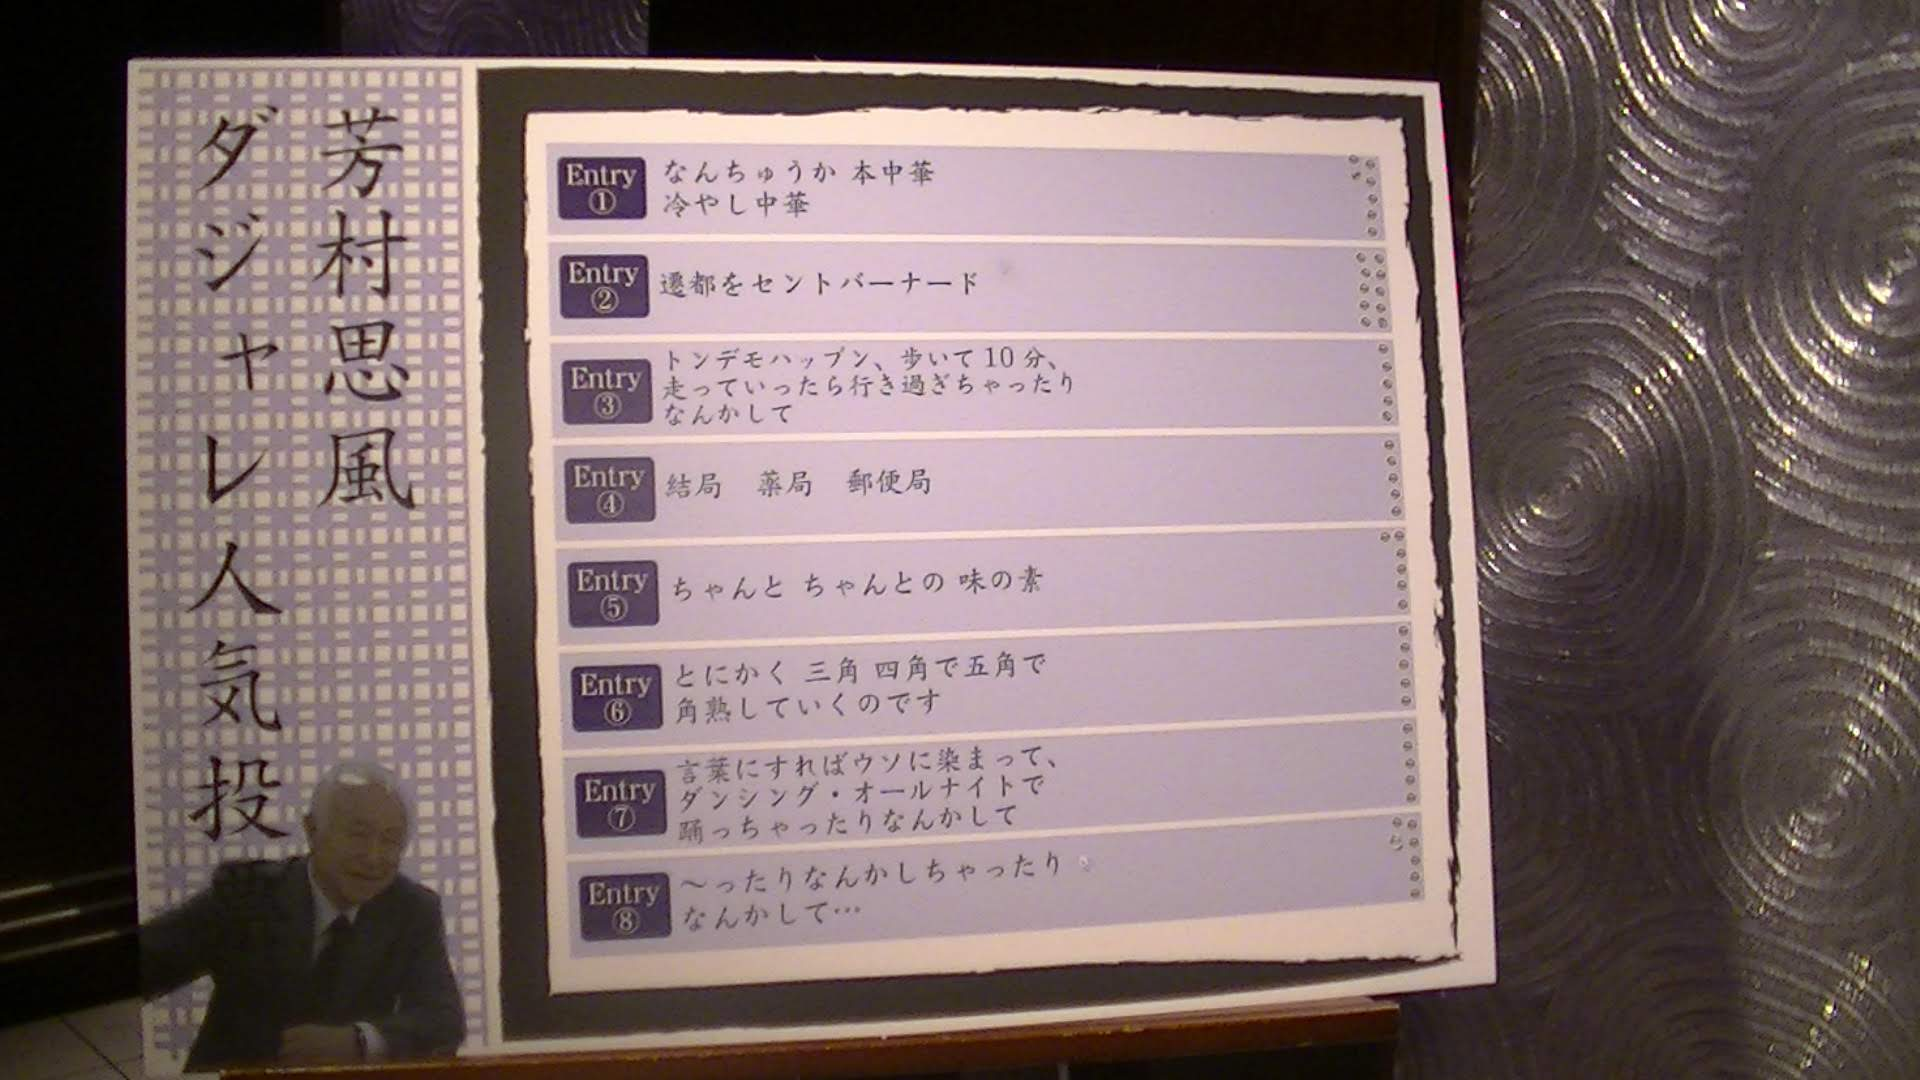 PIC 1620 1 - 思風会全国大会in広島